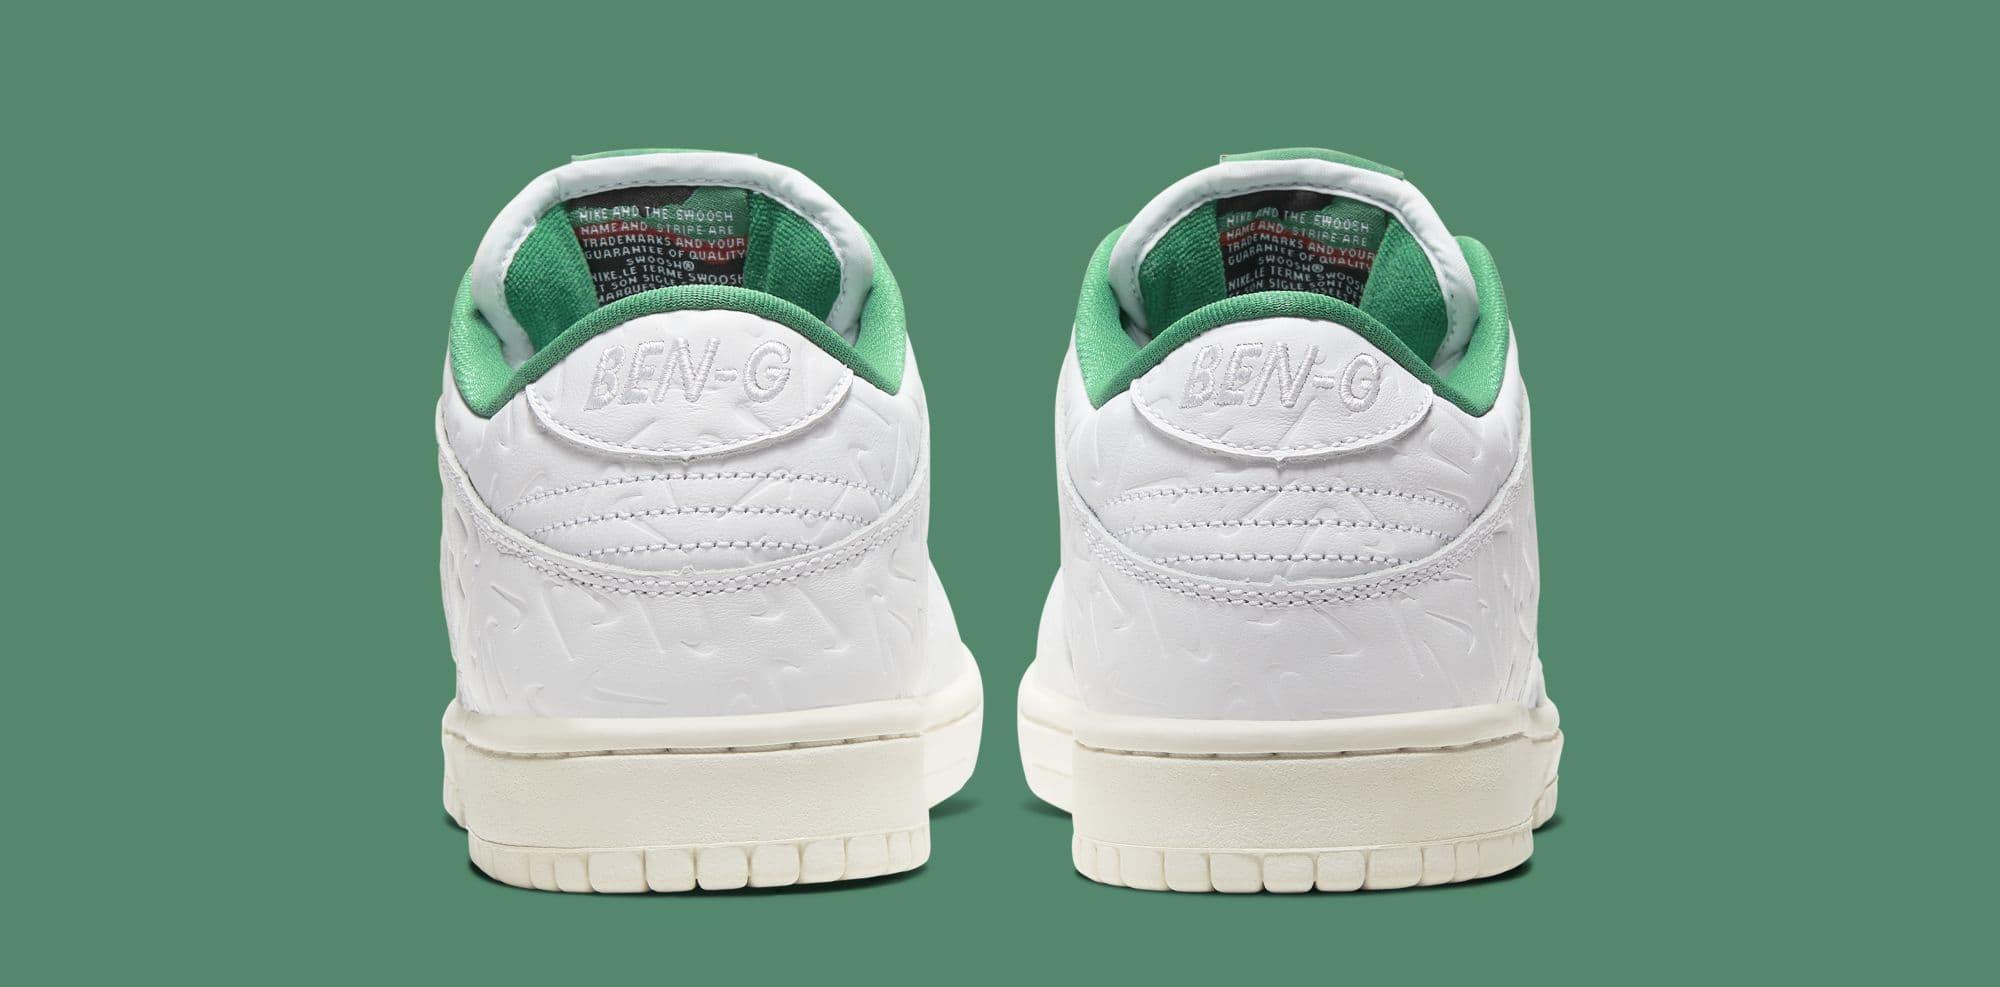 Ben-G x Nike SB Dunk Low CU3846-100 (Heel)